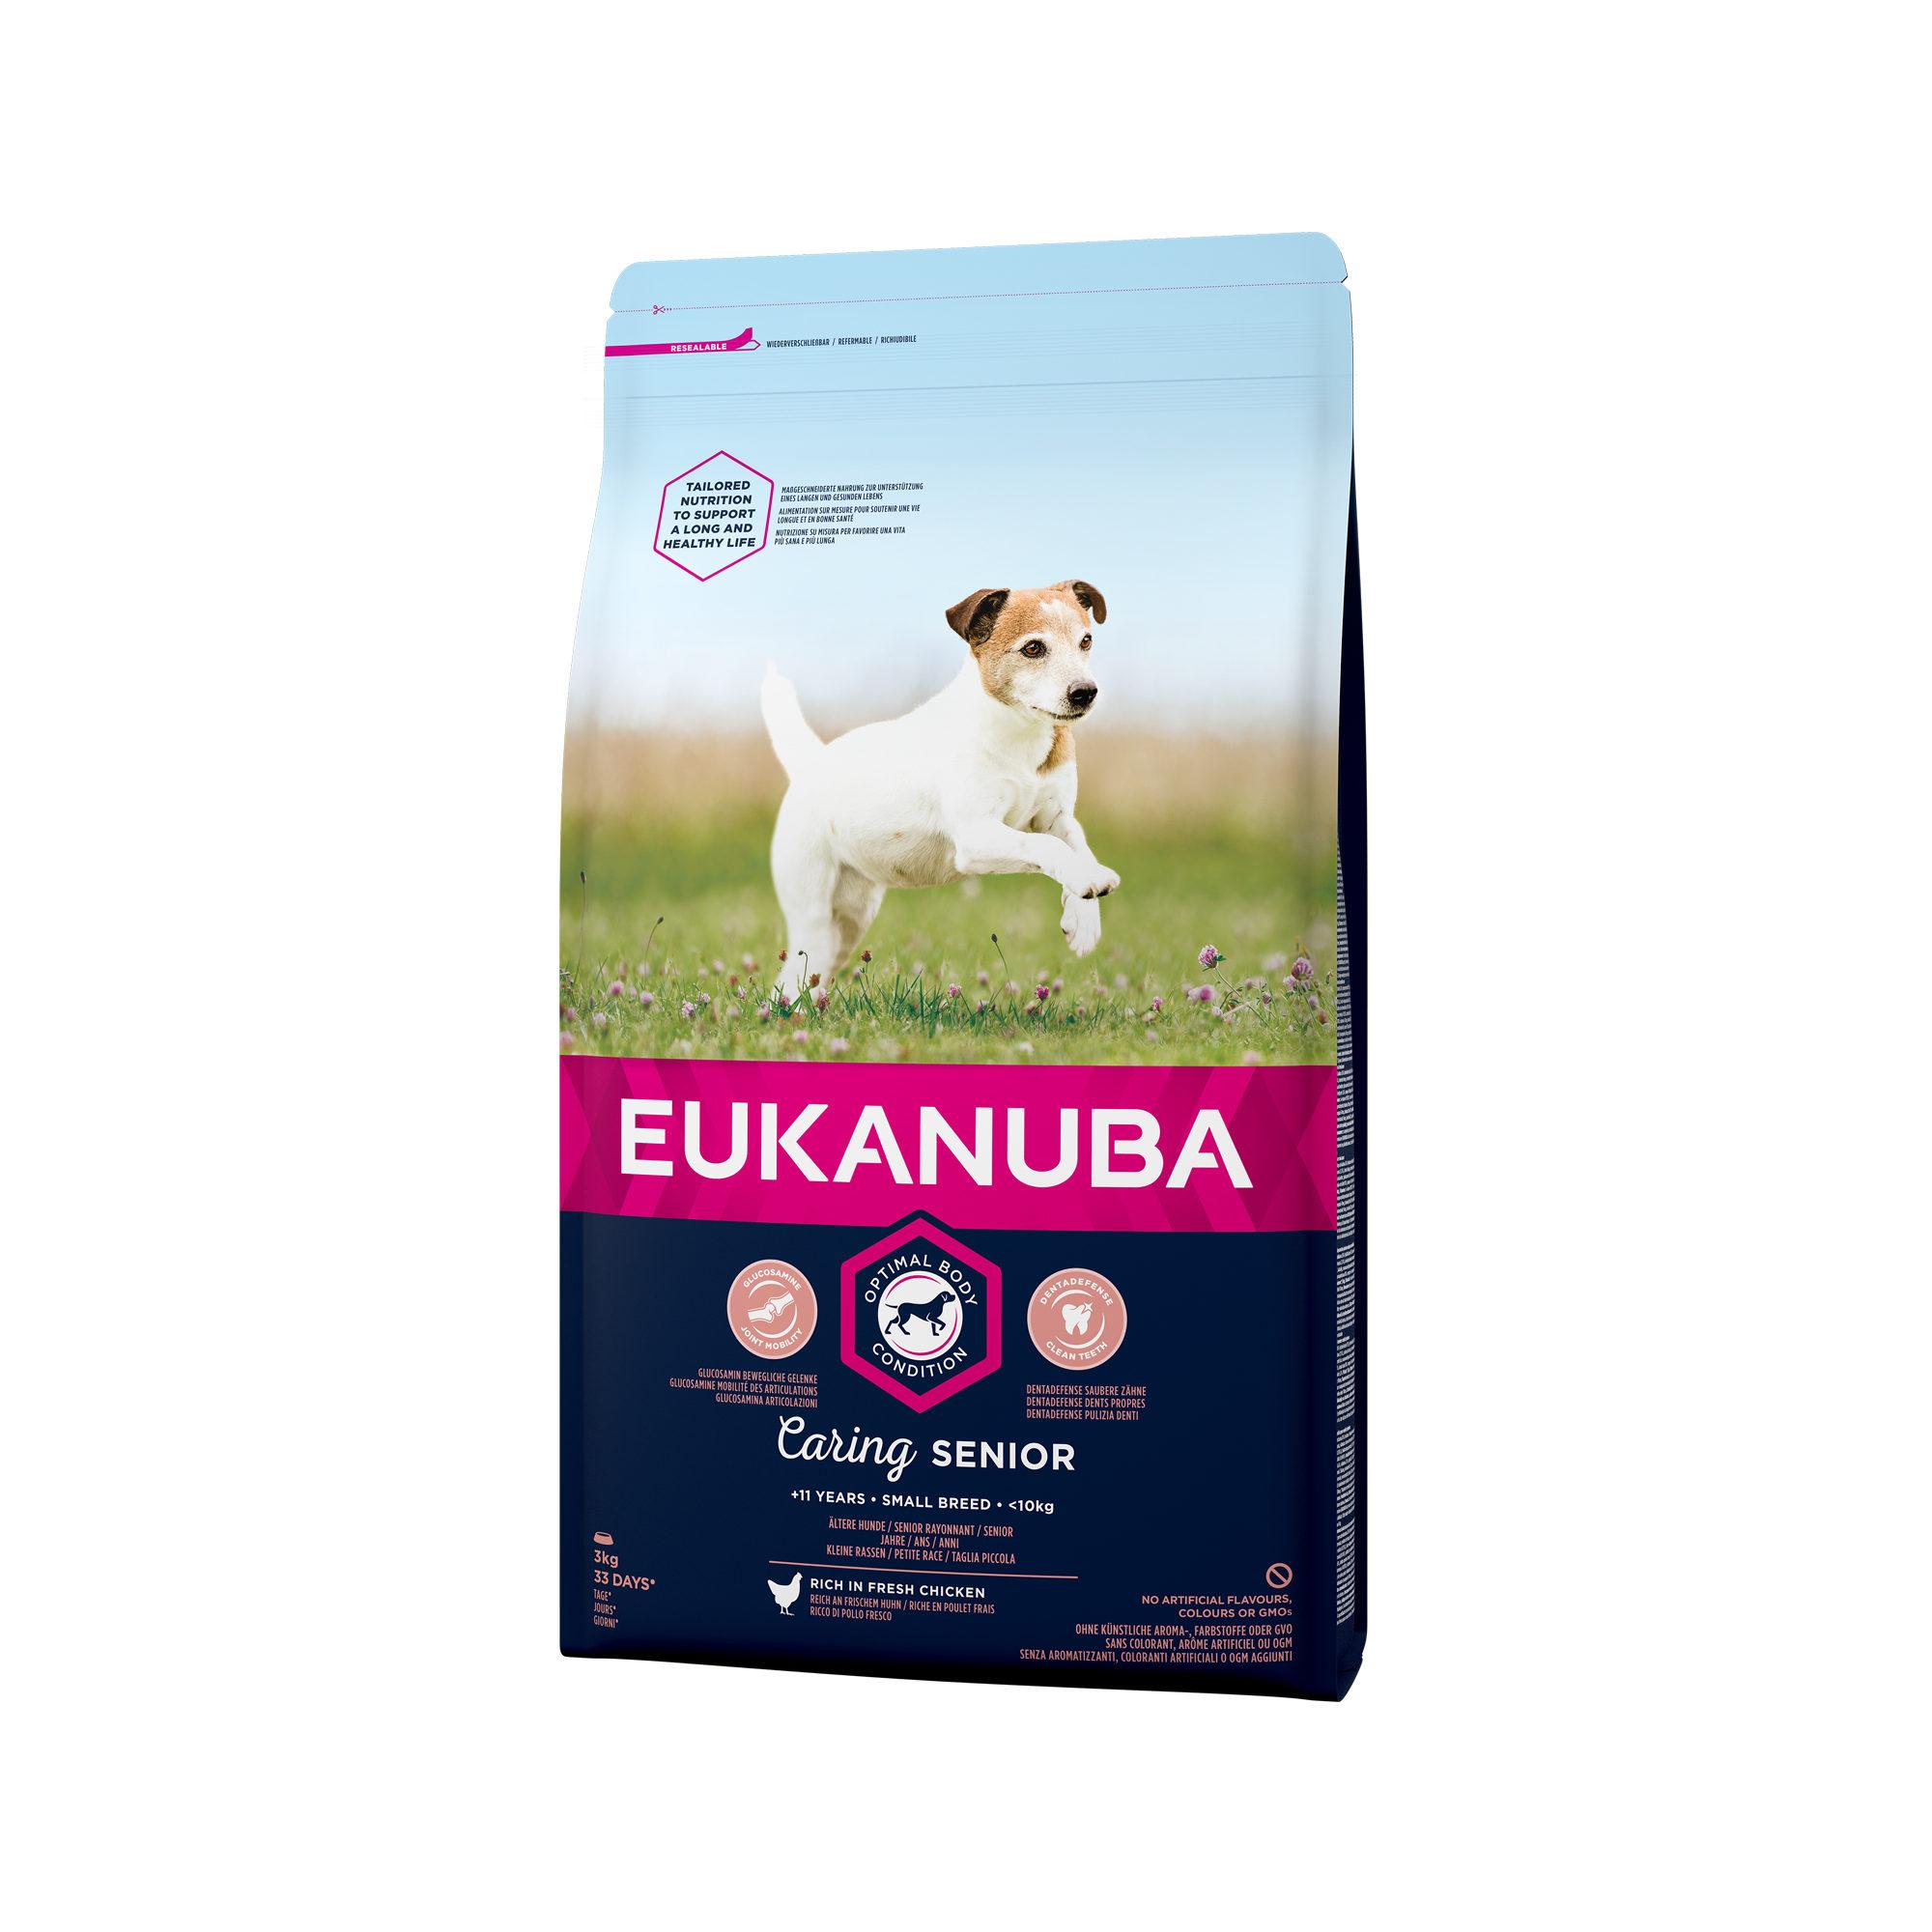 Eukanuba Caring Senior Small Breed